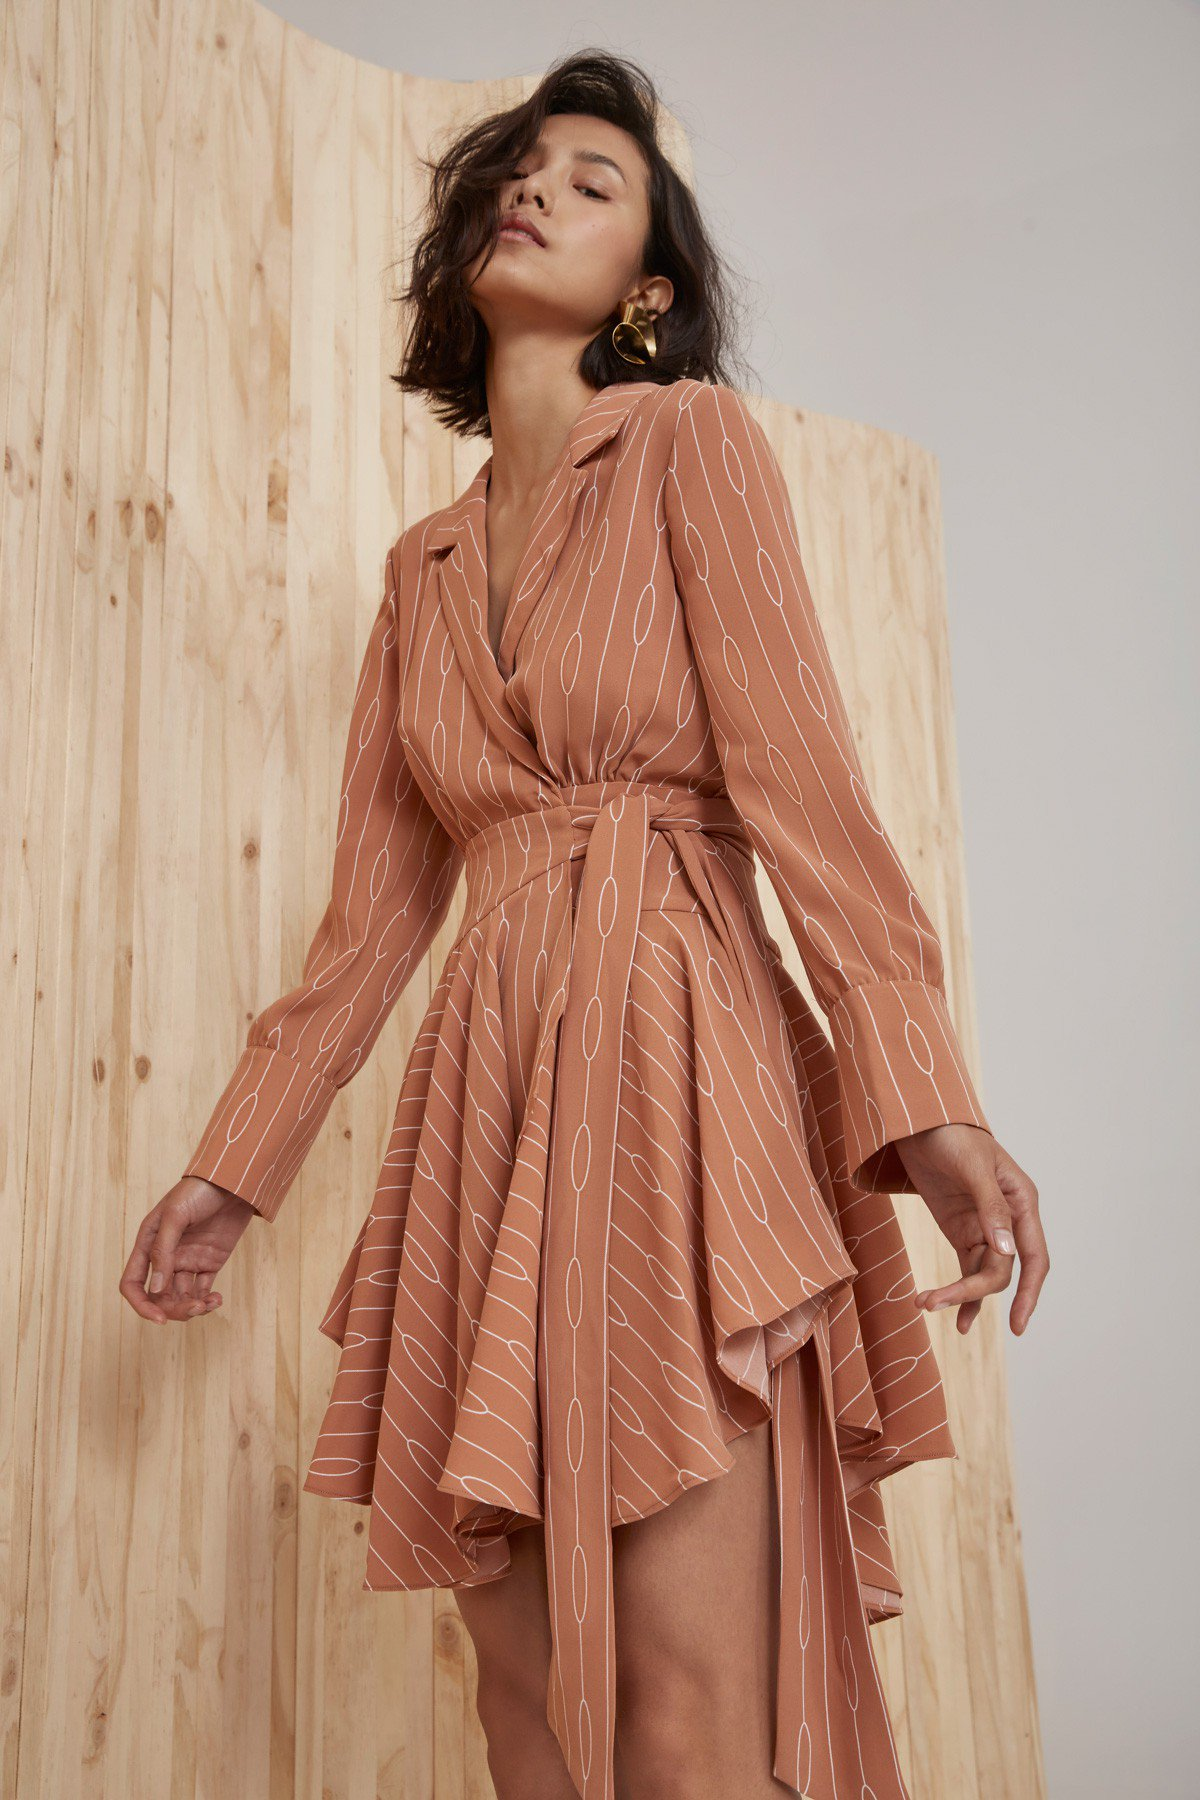 Shop C/MEO Everlasting Long Sleeve Dress.